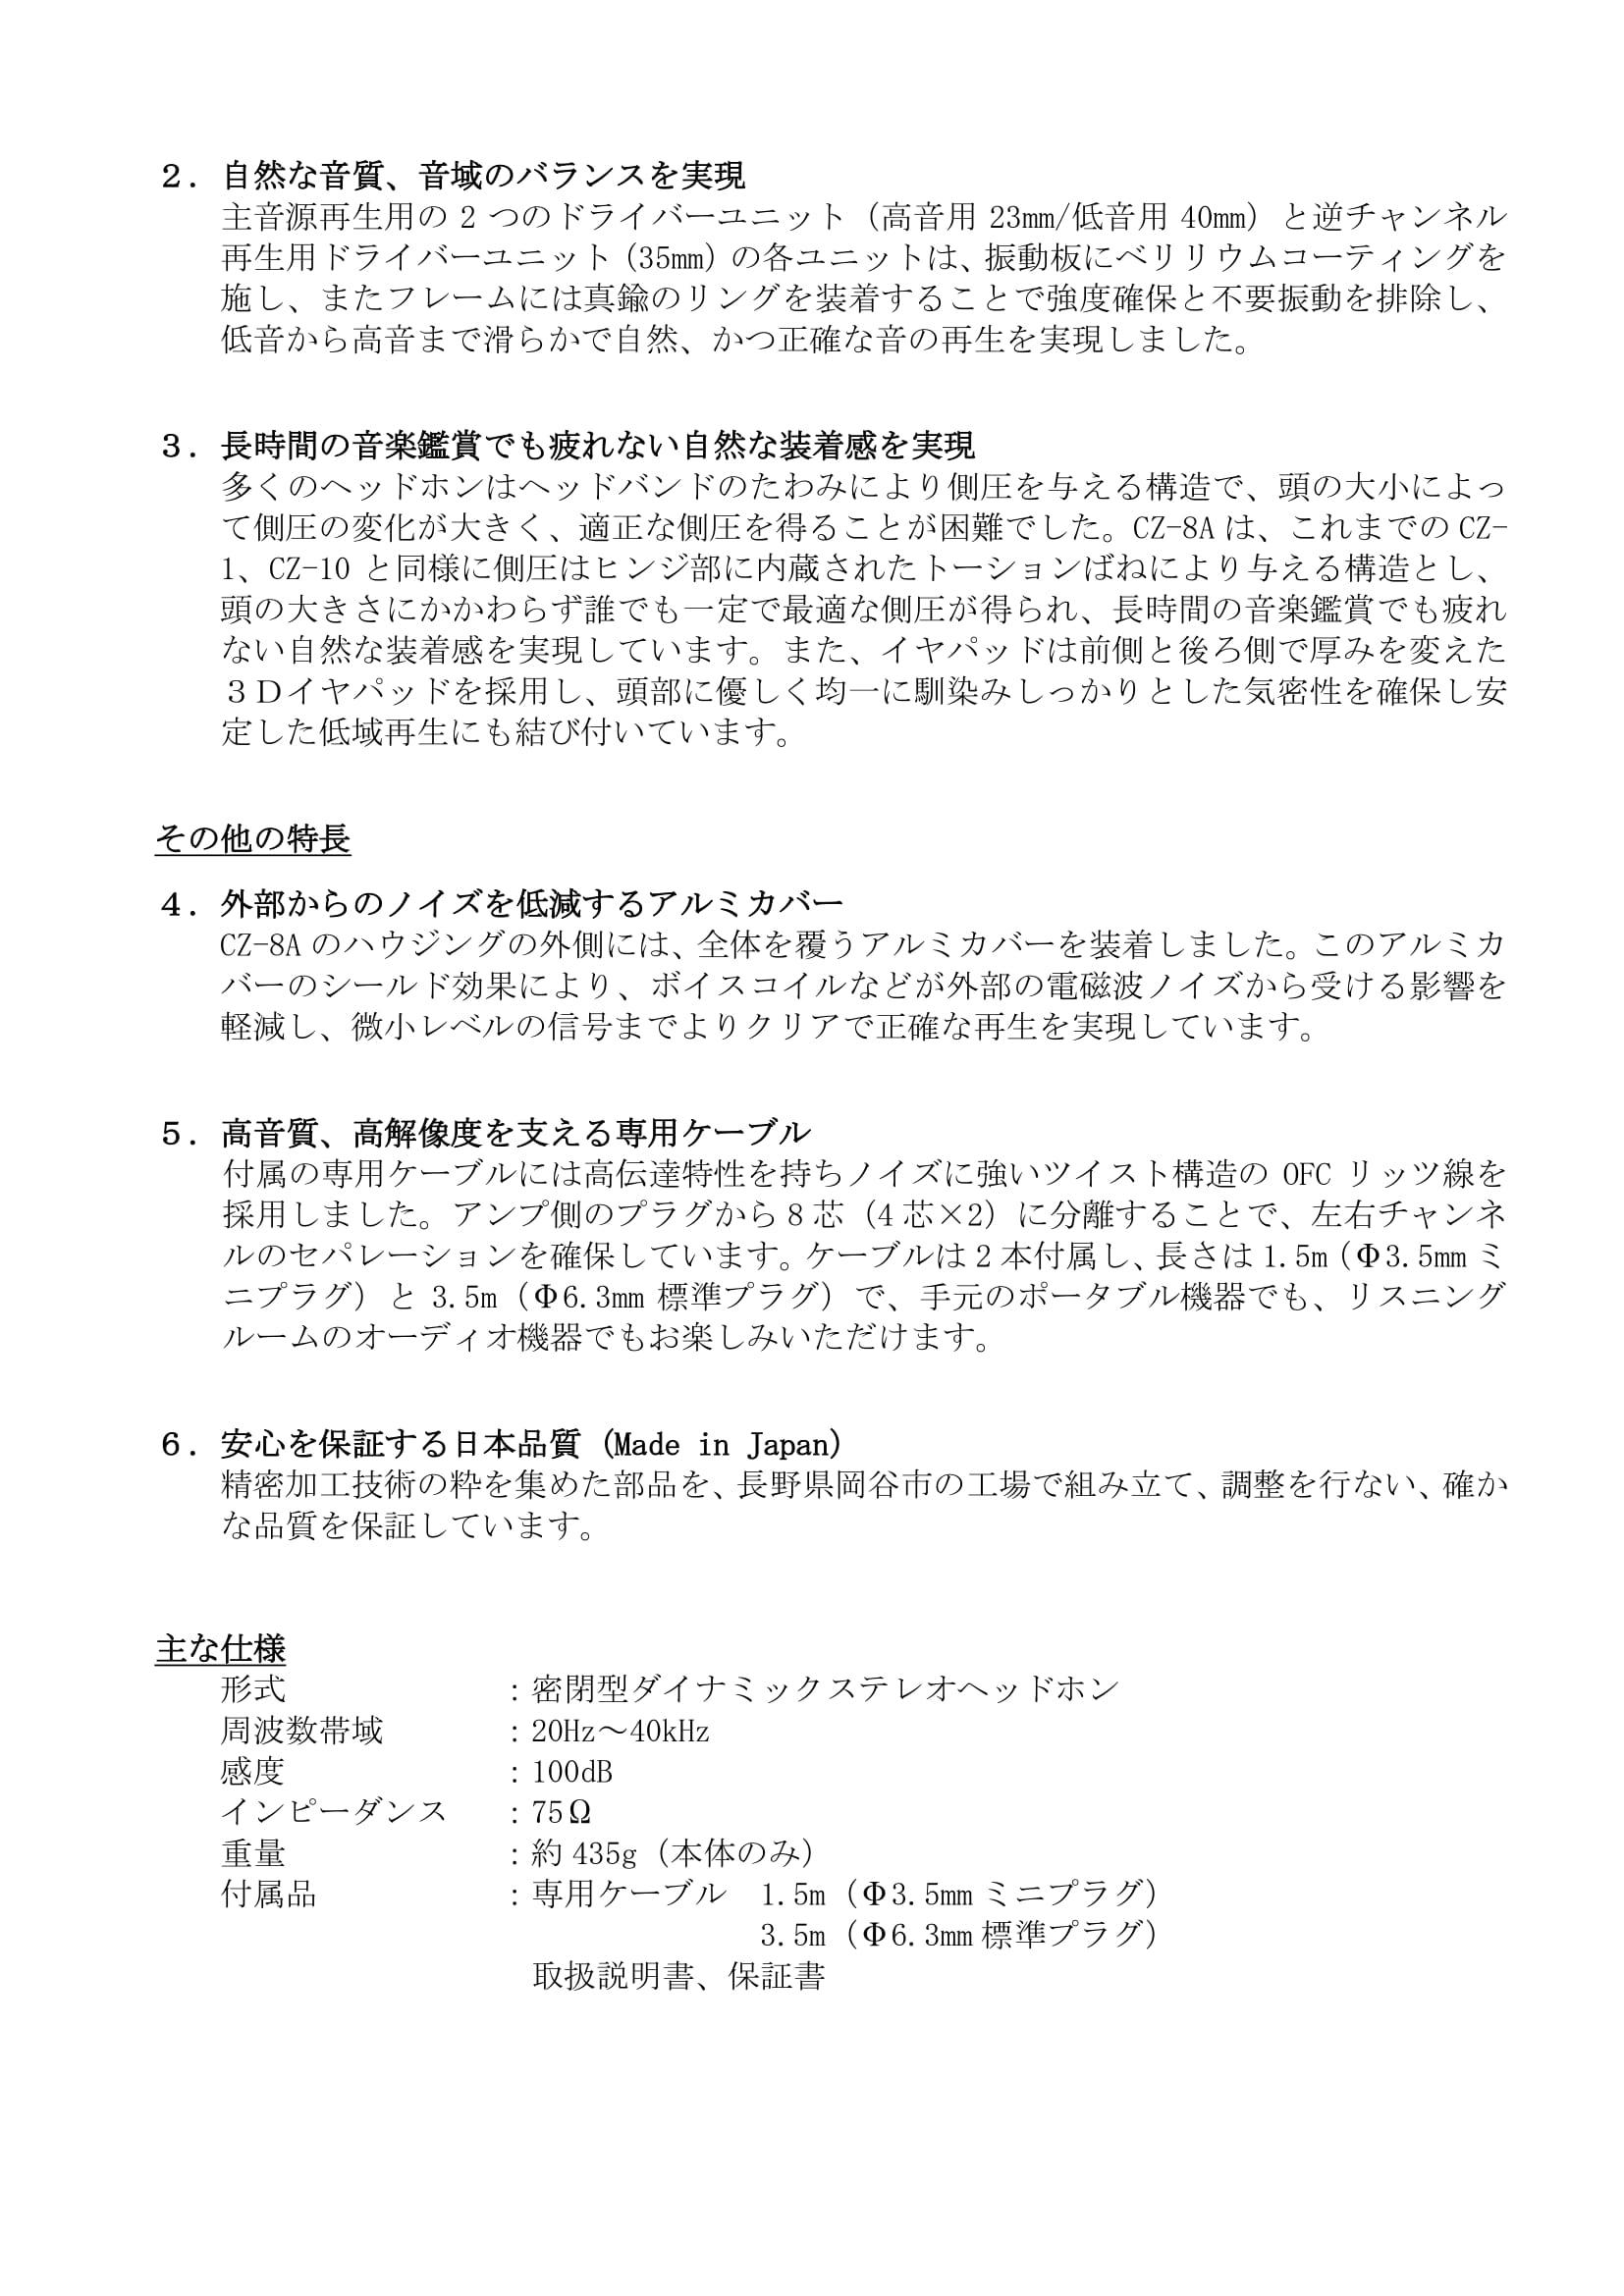 CROSSZONE CZ-8Aニュースリリース210414-2